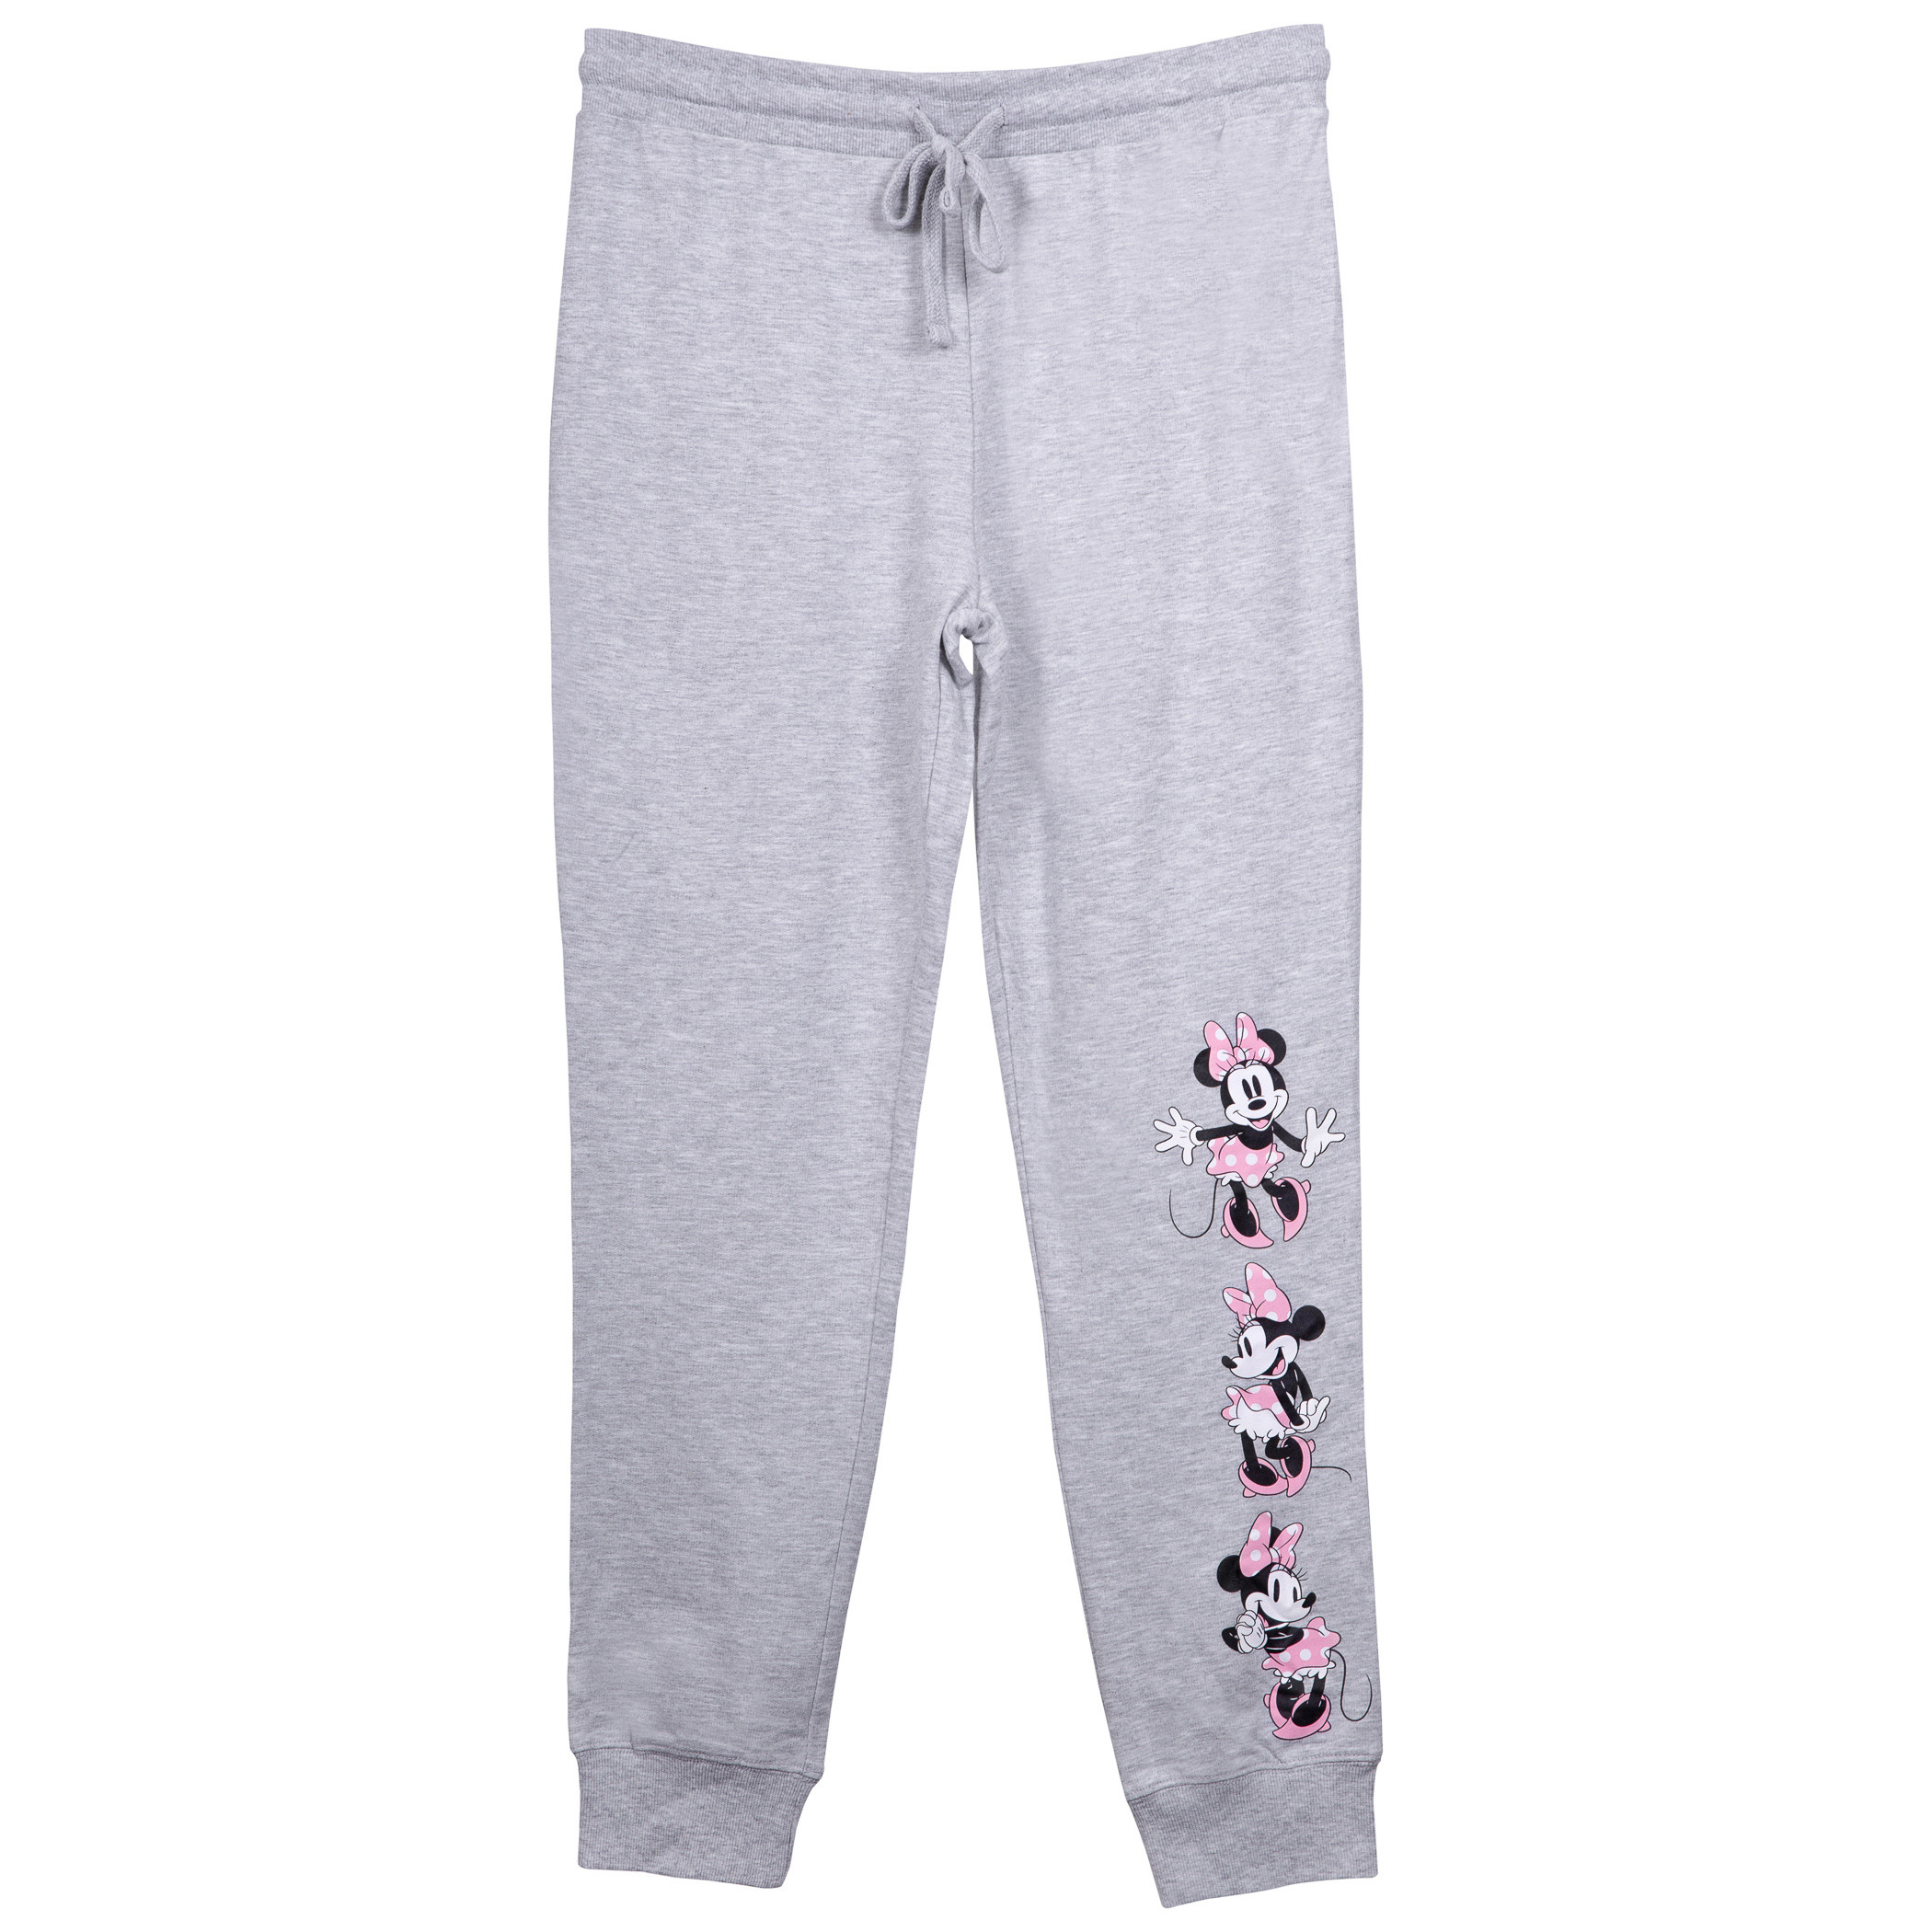 Minnie Mouse Women's Grey Sweatpants